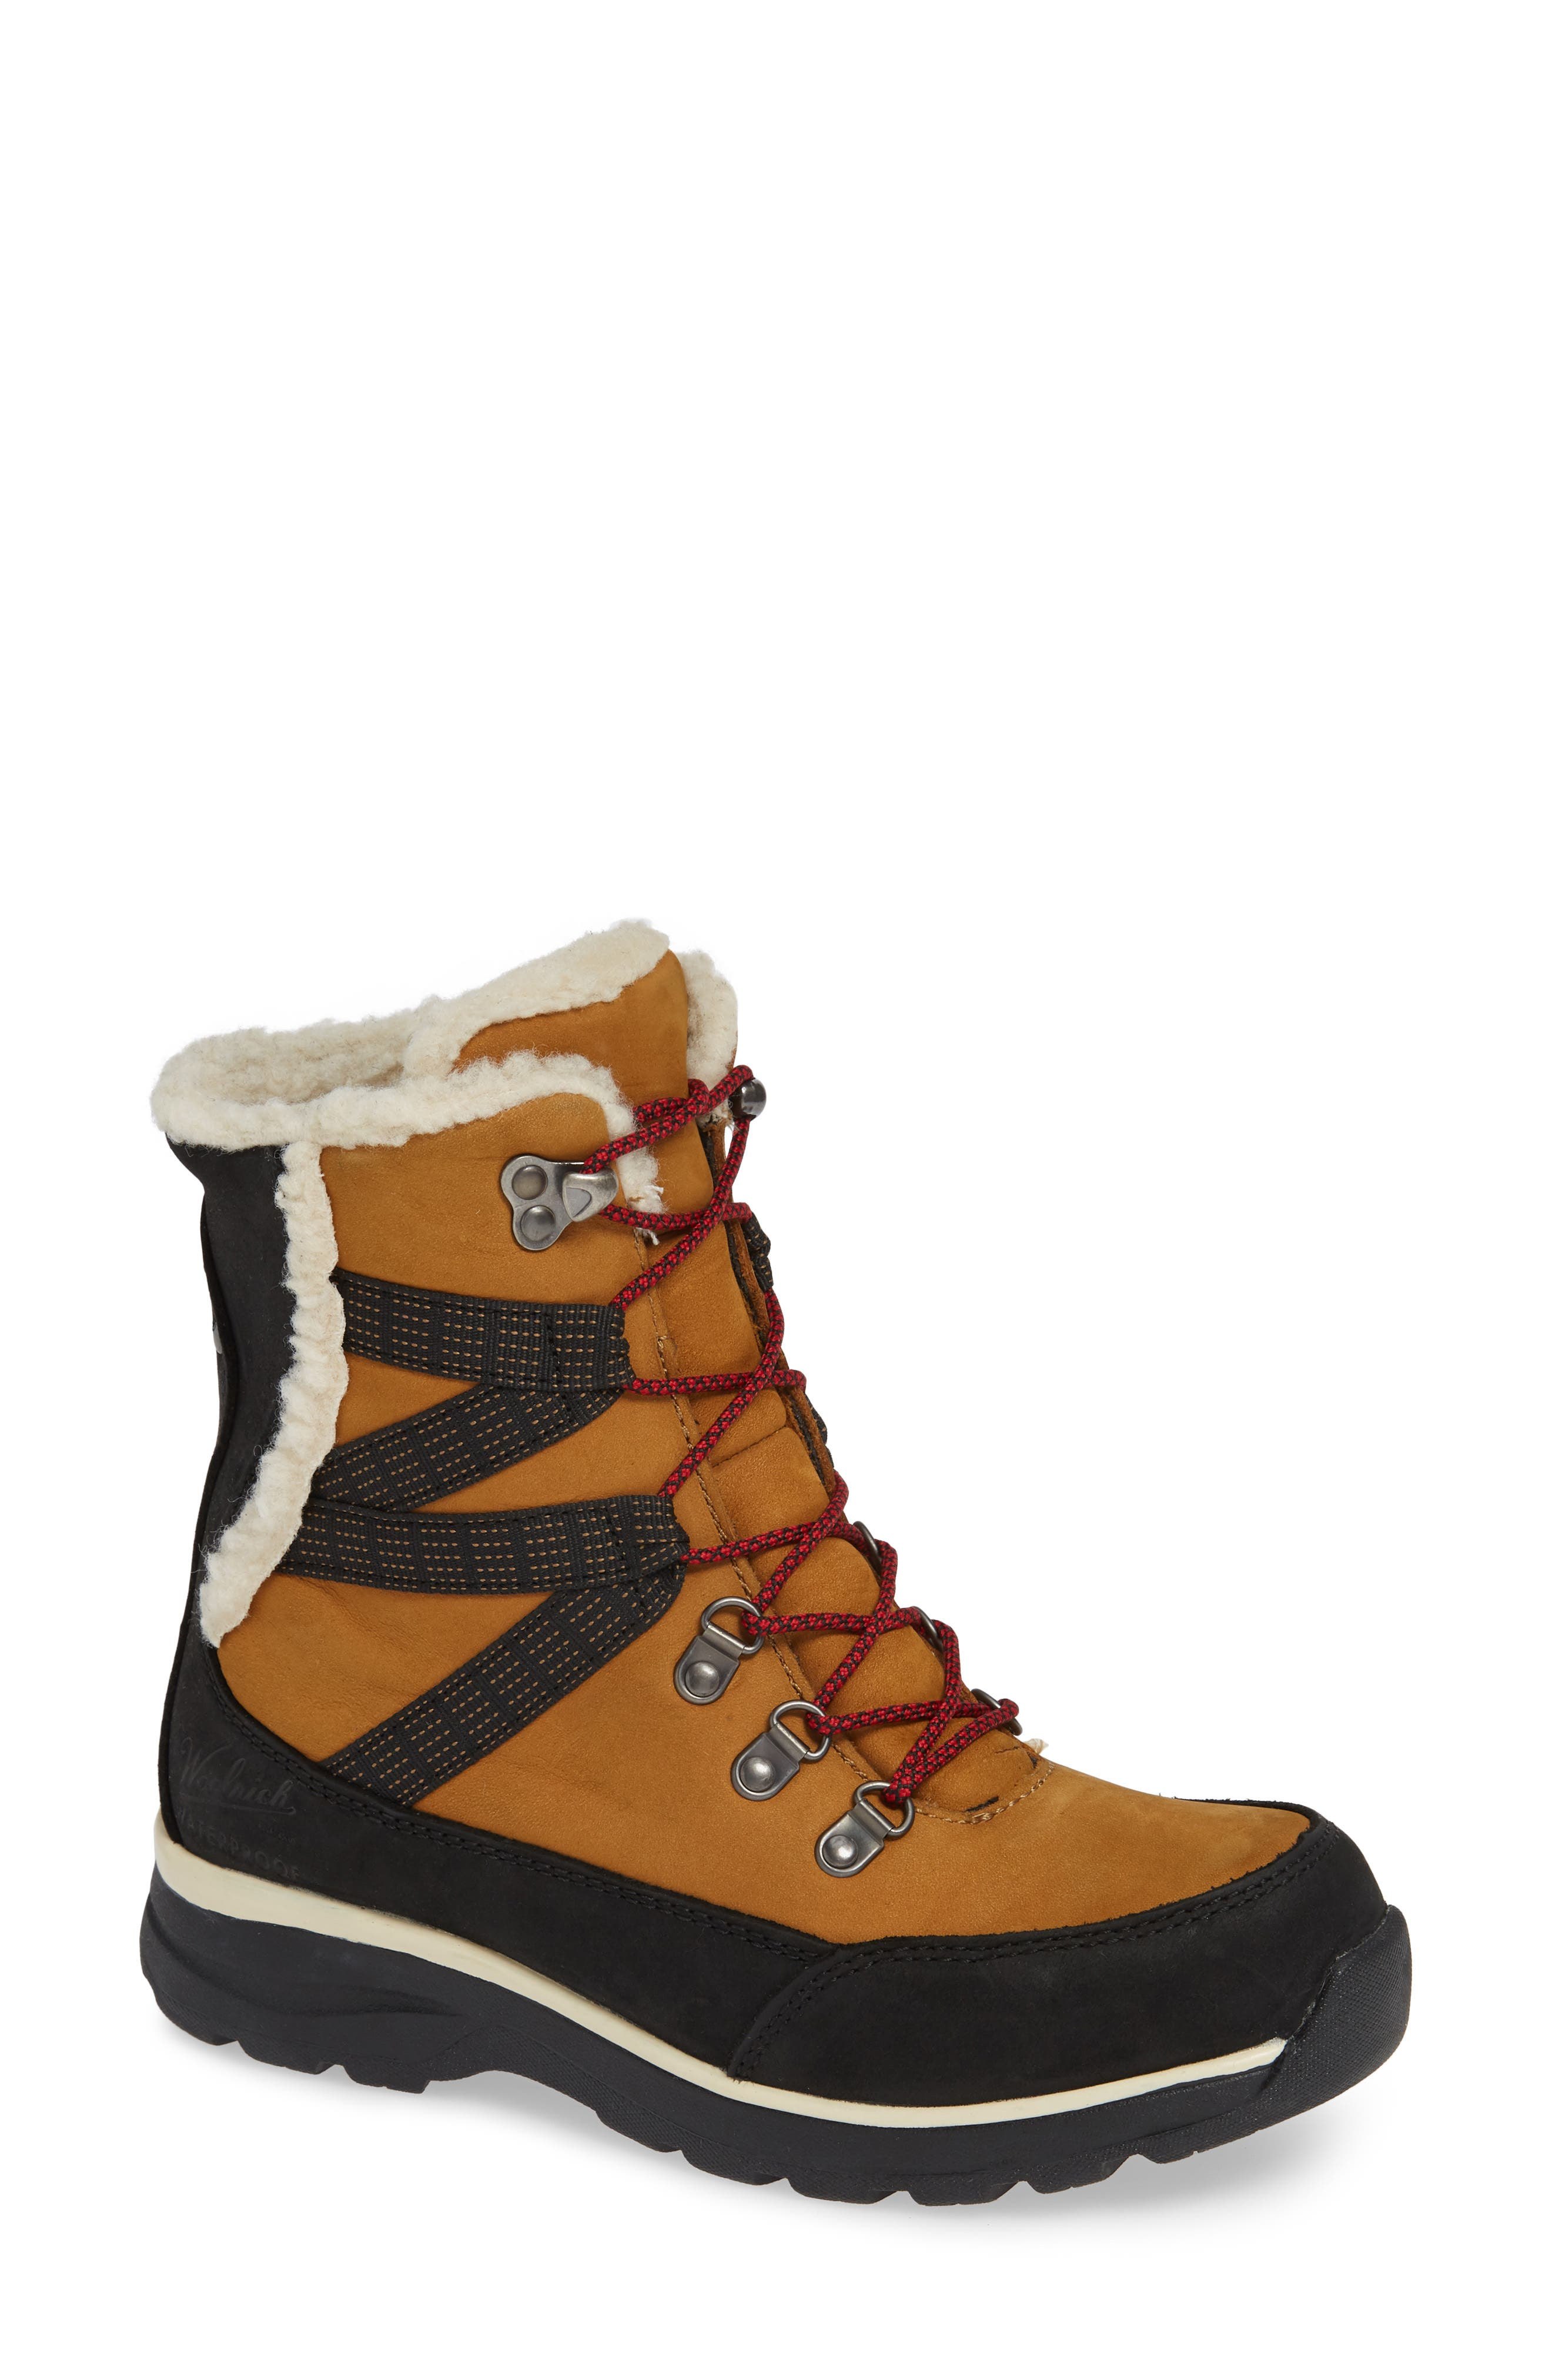 Woolrich Laurel Highlands Hiking Boot- Beige